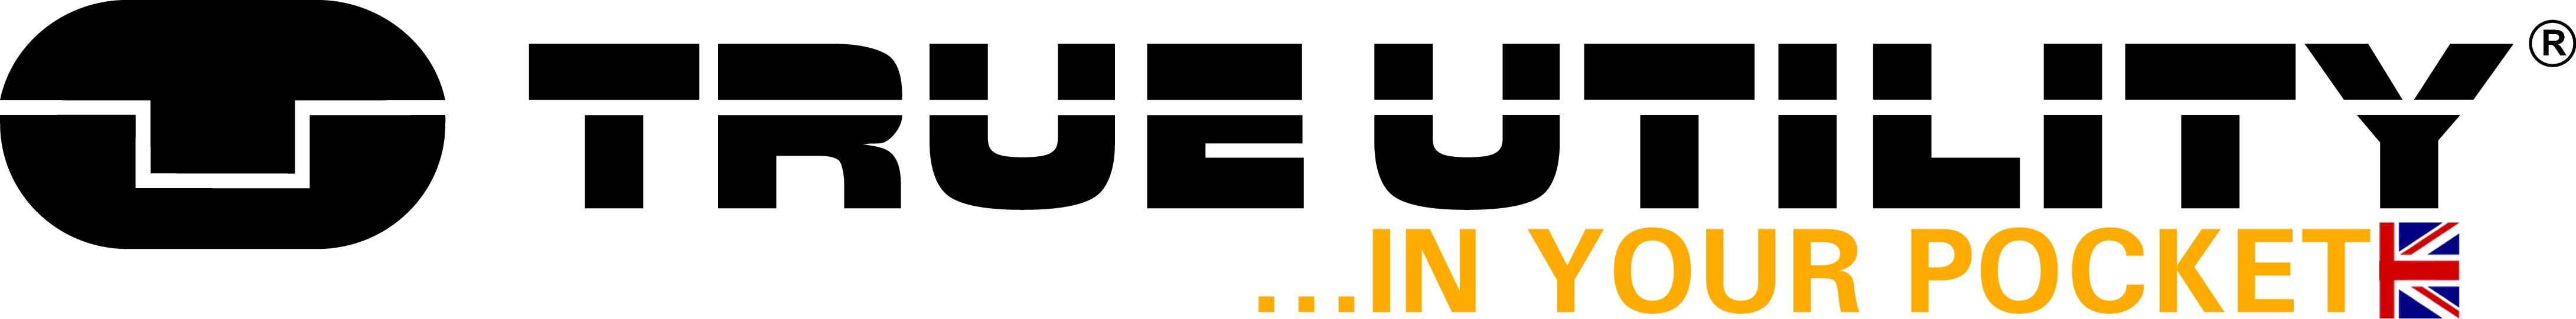 https://0201.nccdn.net/1_2/000/000/16e/bae/True-Utility-Logo.jpg